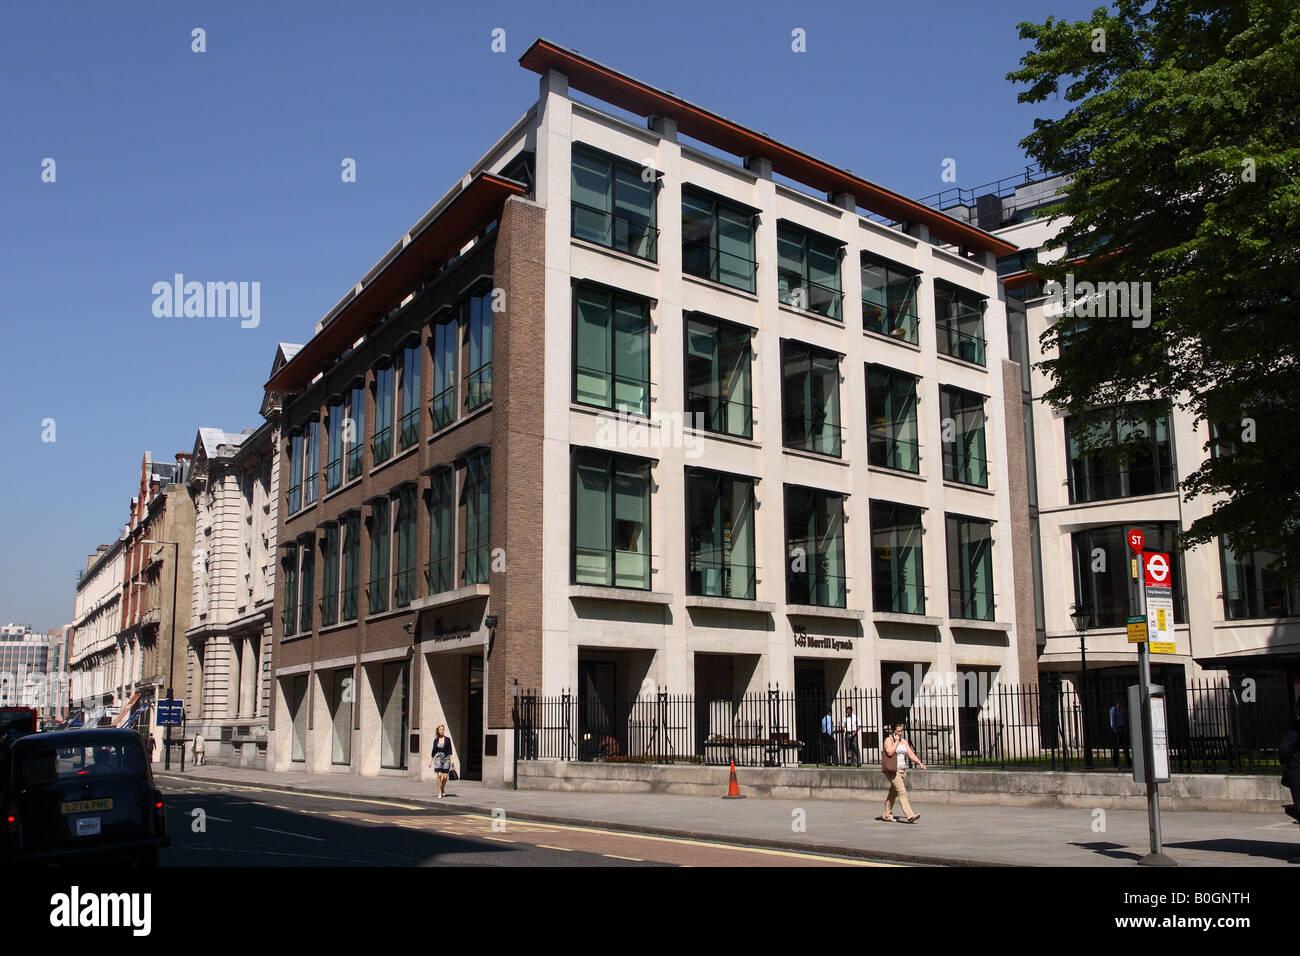 Merrill Lynch Financial Centre Building In King Edward